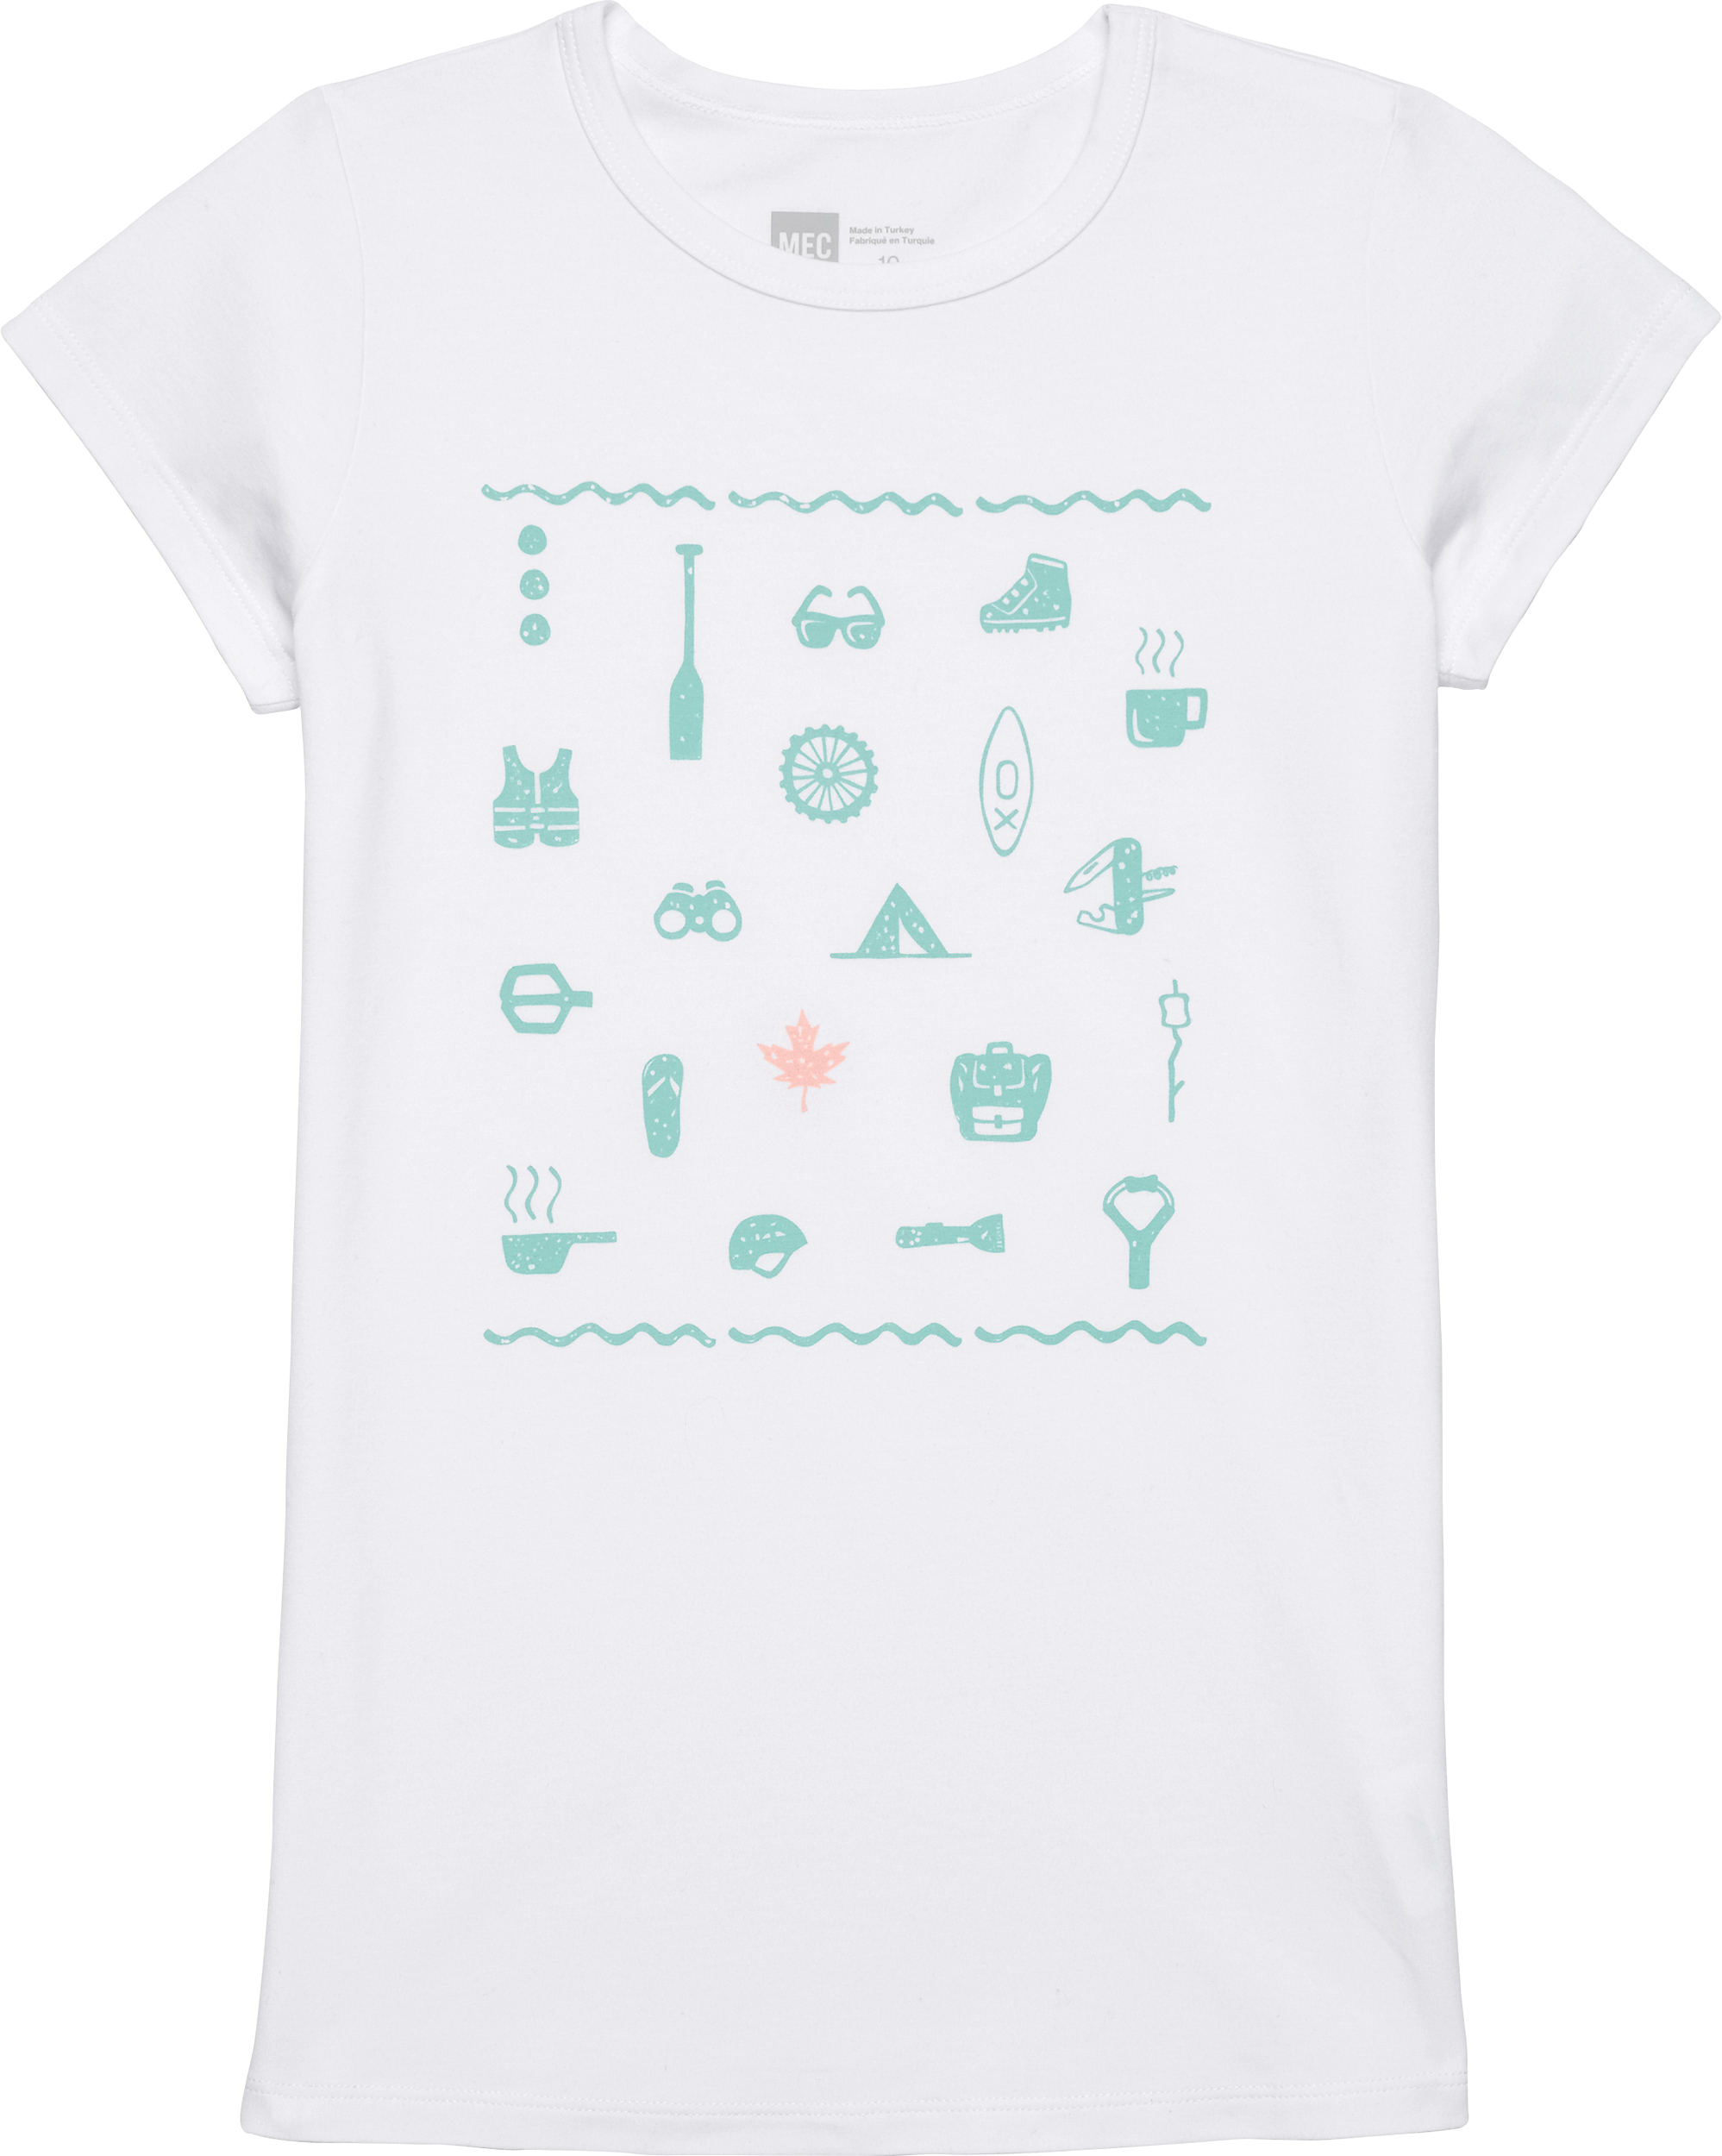 b3fa957e43c Short sleeved shirts